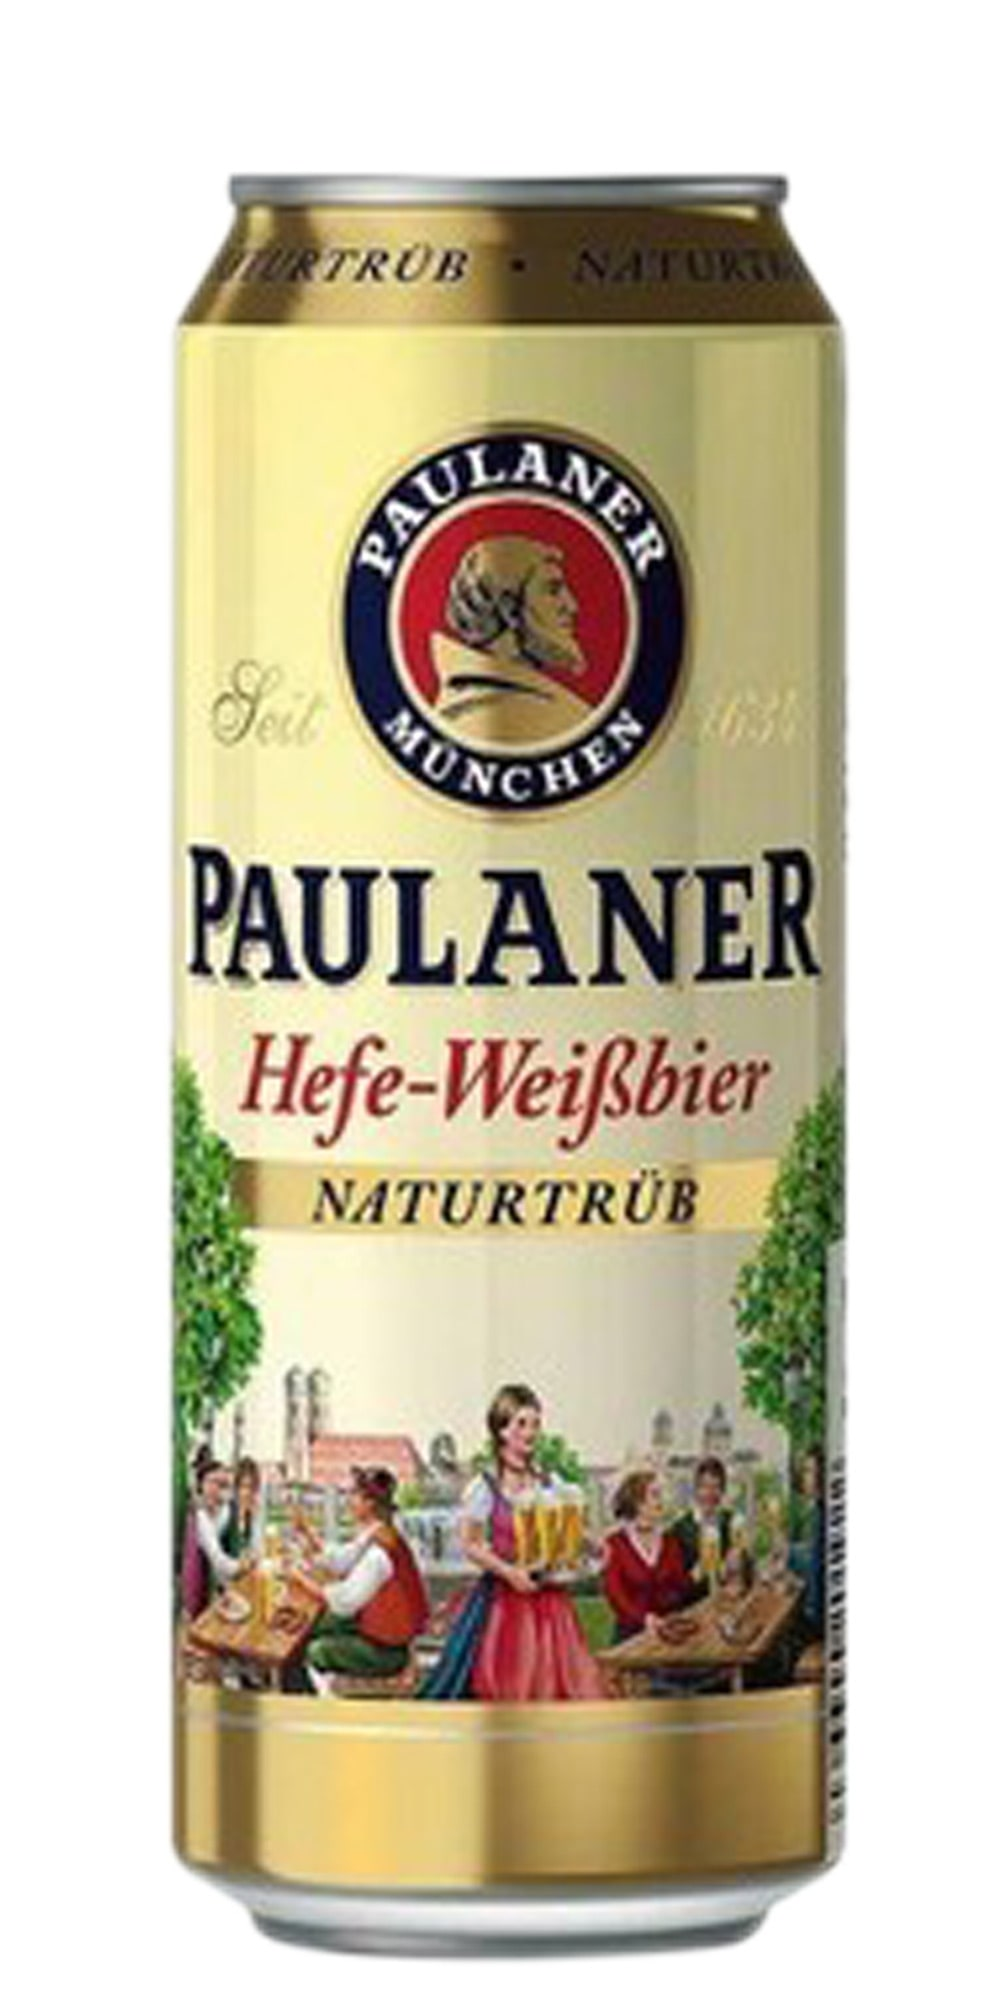 Cerveja Paulaner Hefe Weissbier Naturtrub lata 500ml